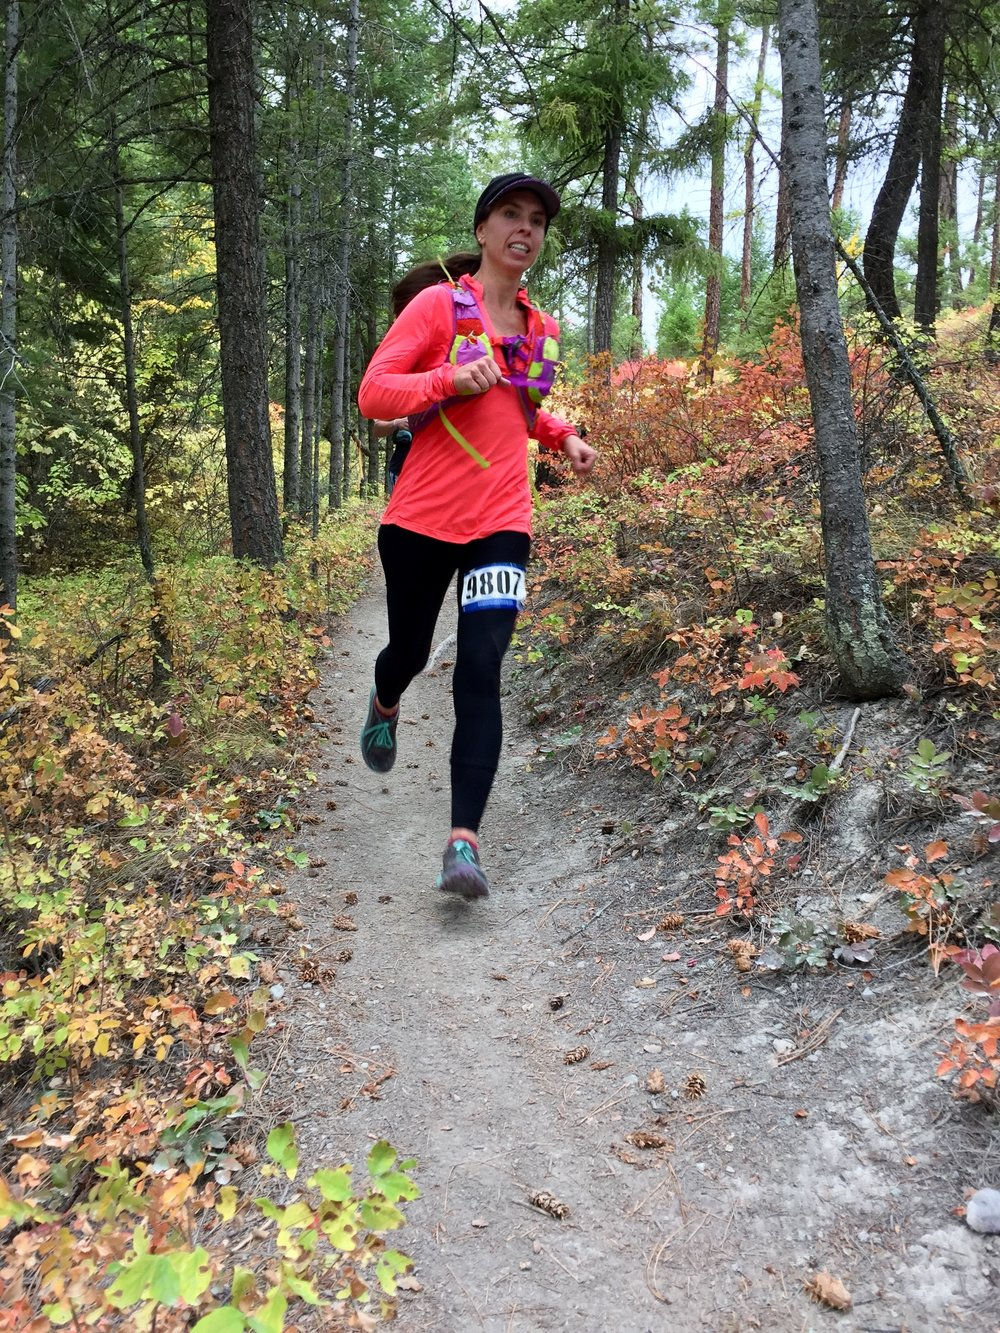 foys to blacktail trails trail marathon ftbtIMG_6633.JPG